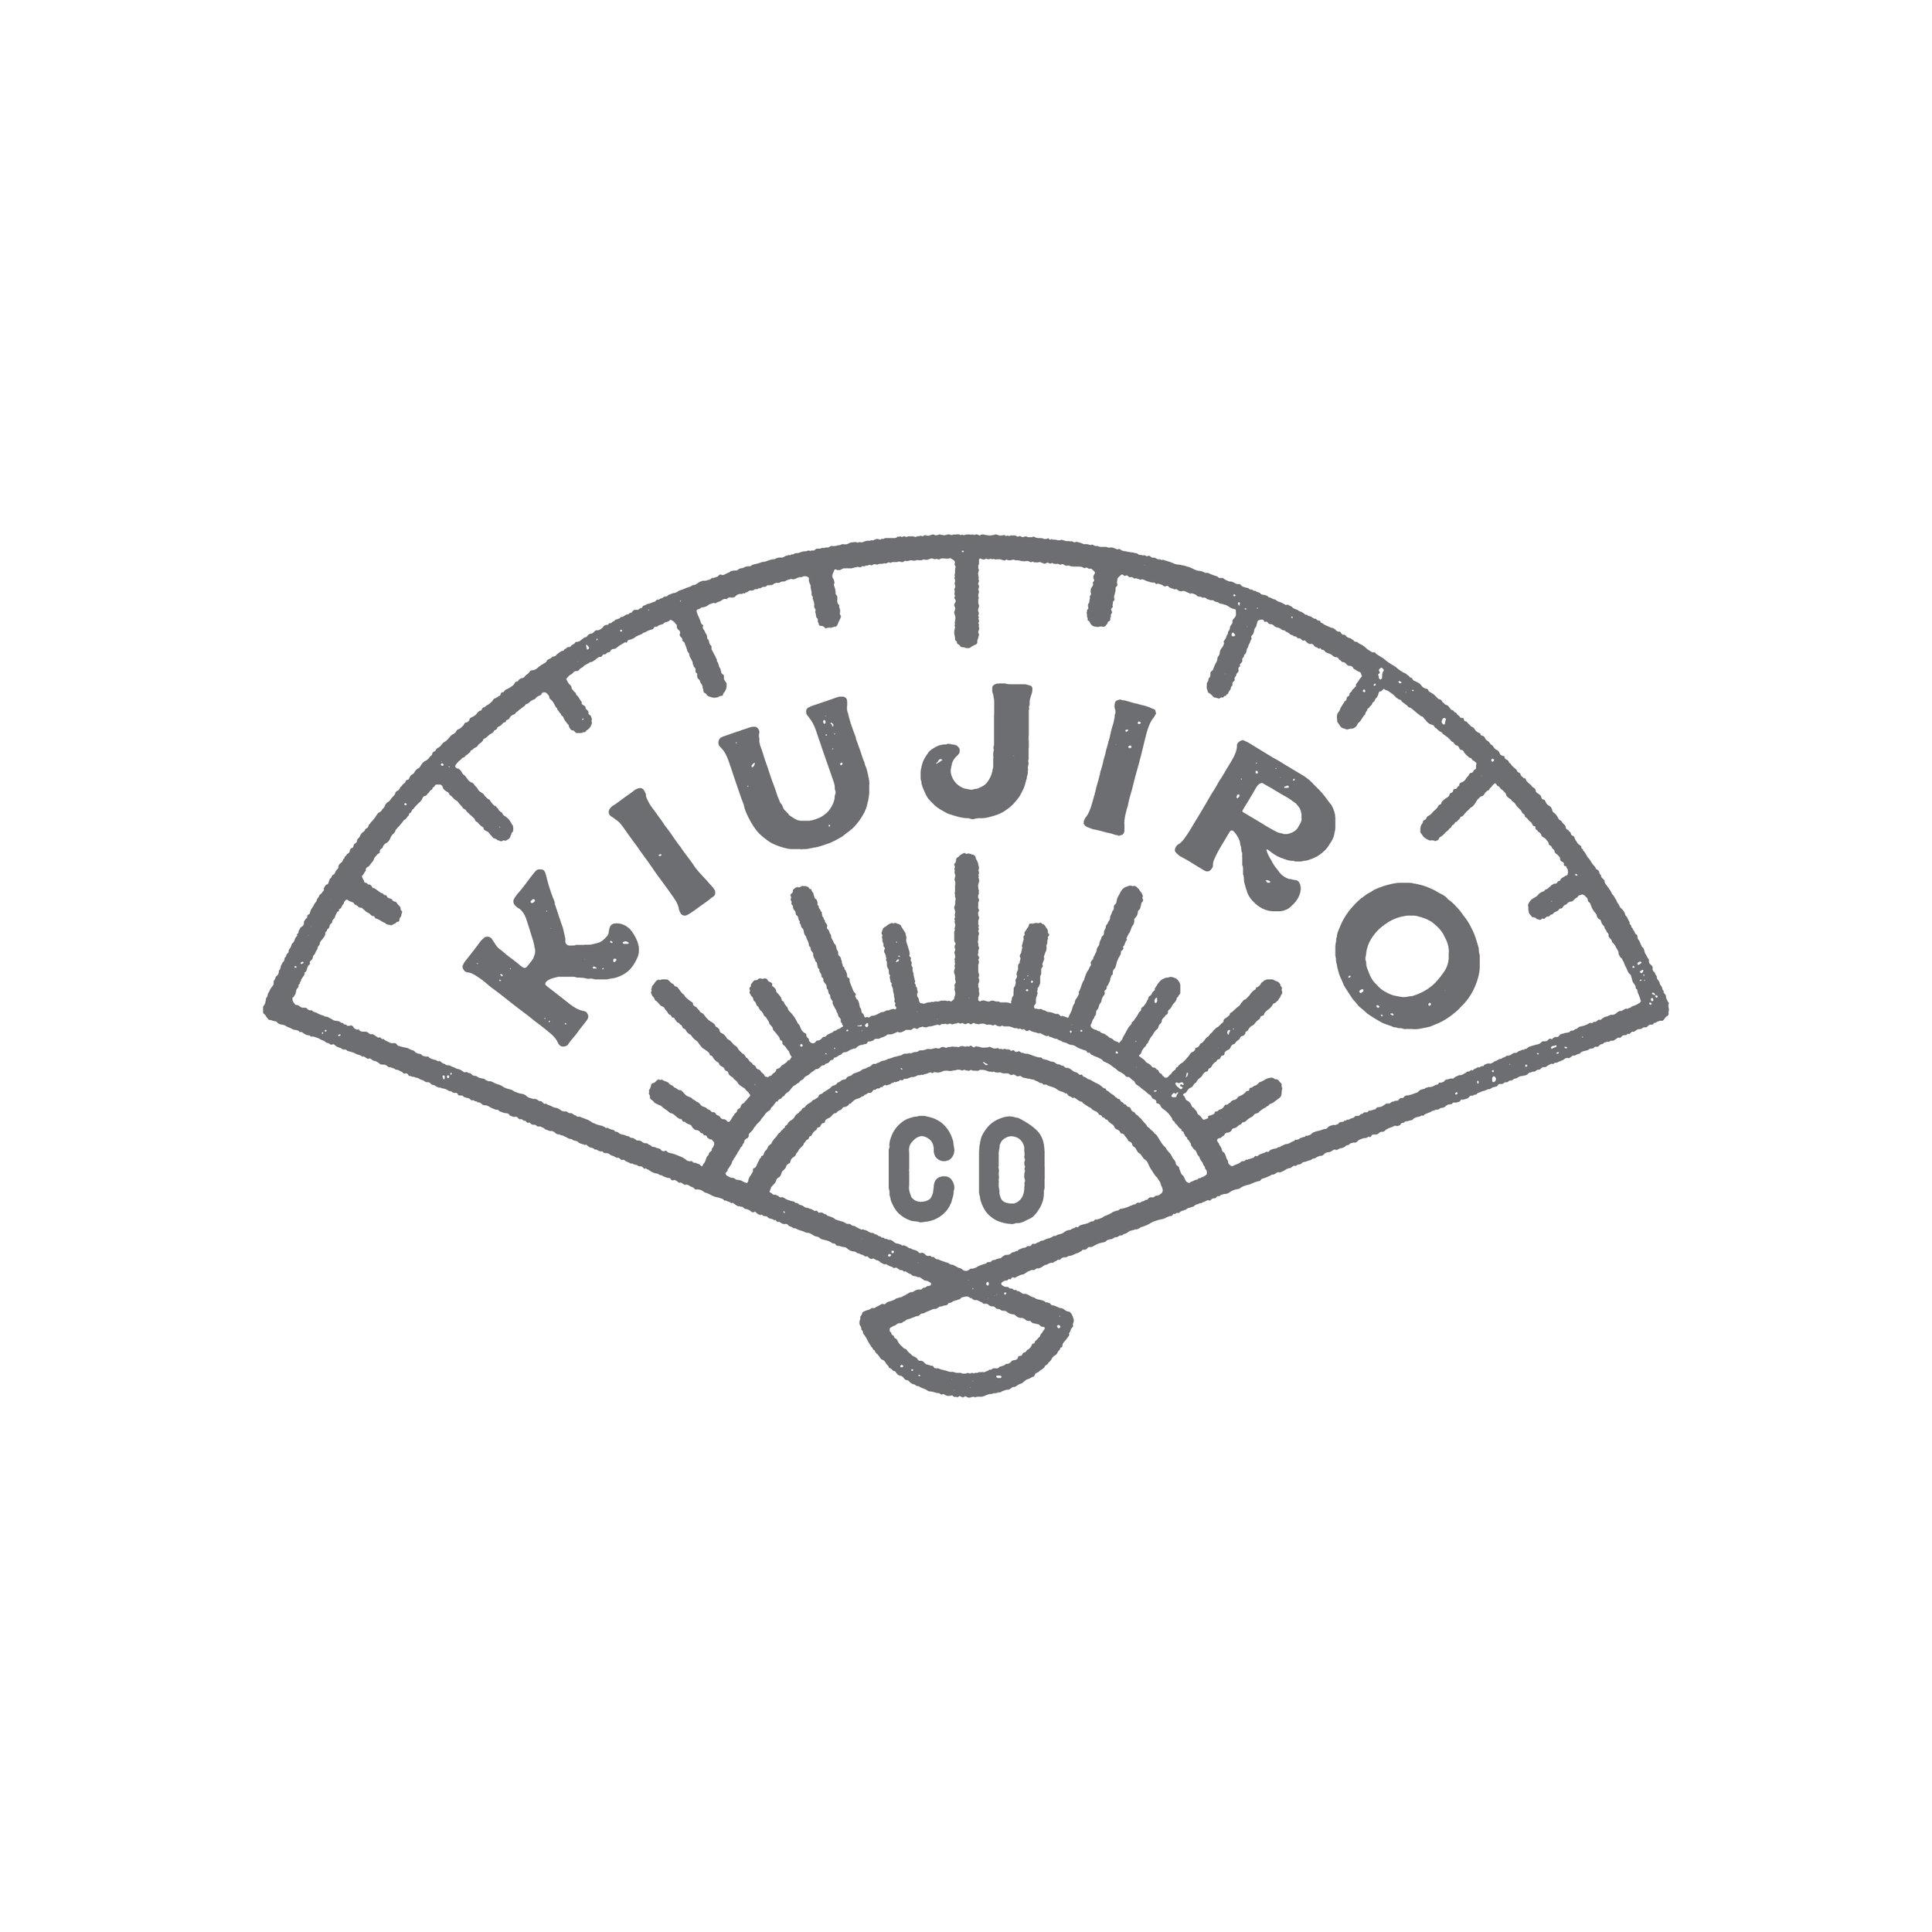 Kiujiro(grey)-01-01.jpg